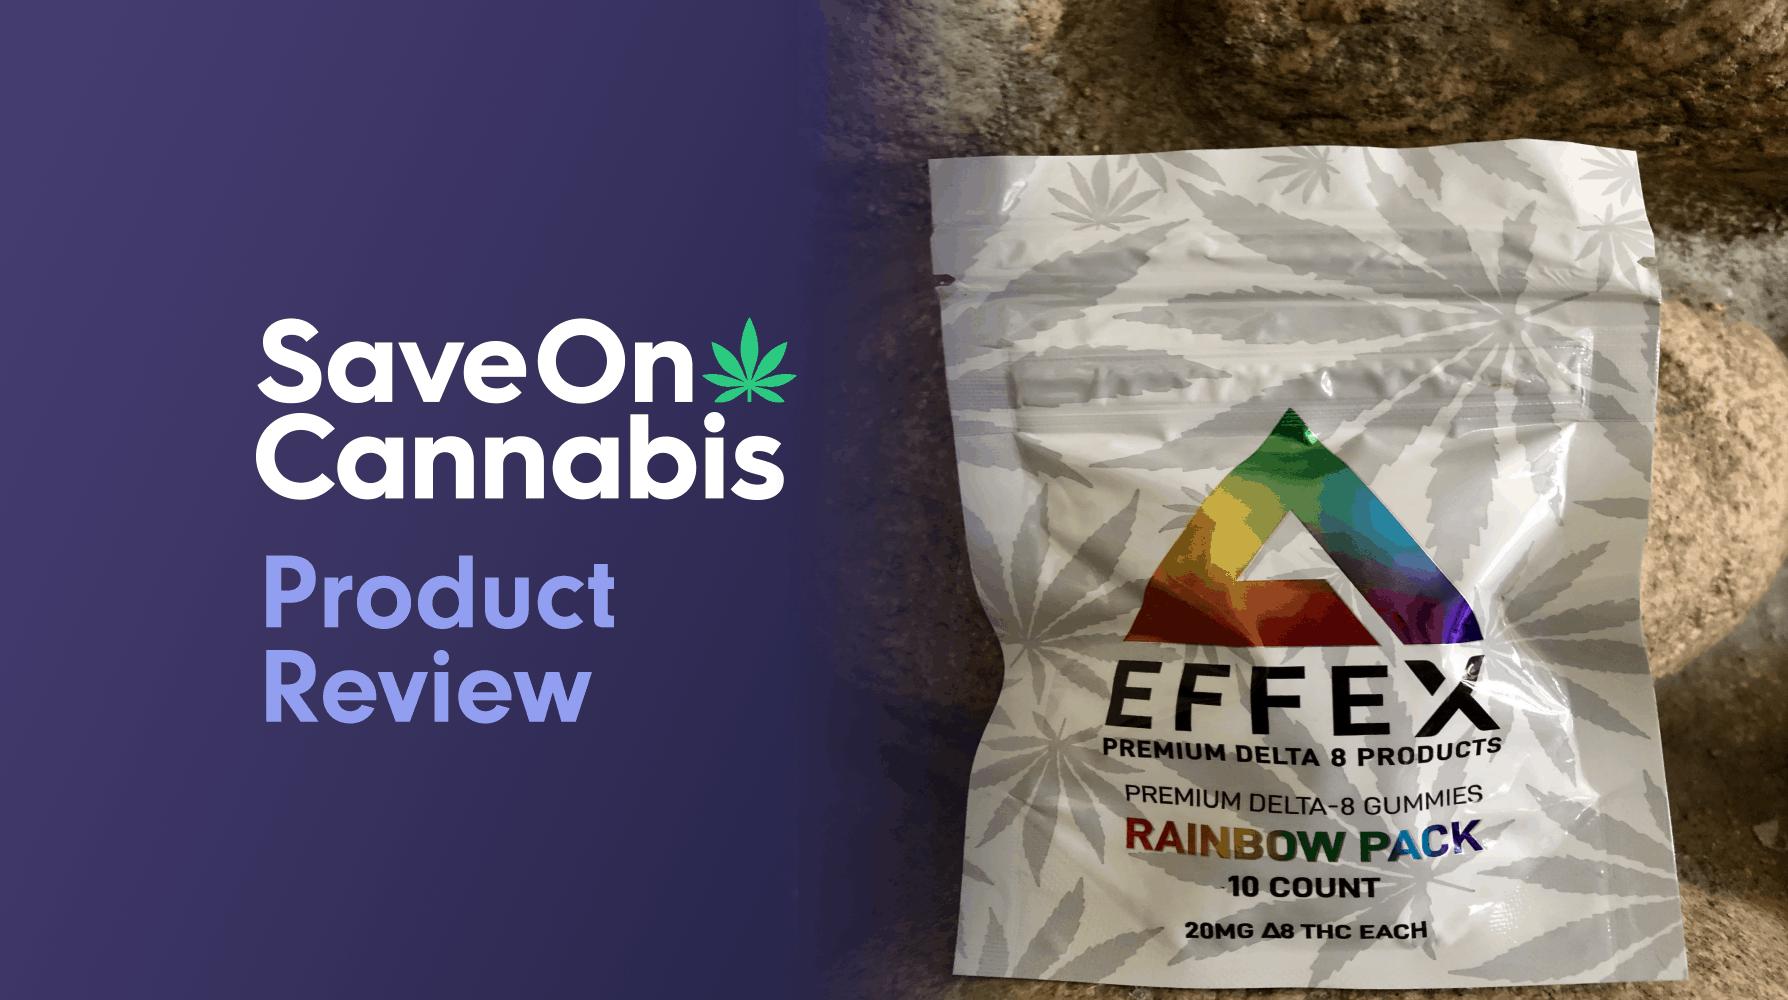 Delta Effex Rainbow Pack Premium Delta 8 THC Gummies Save On Cannabis Review Website